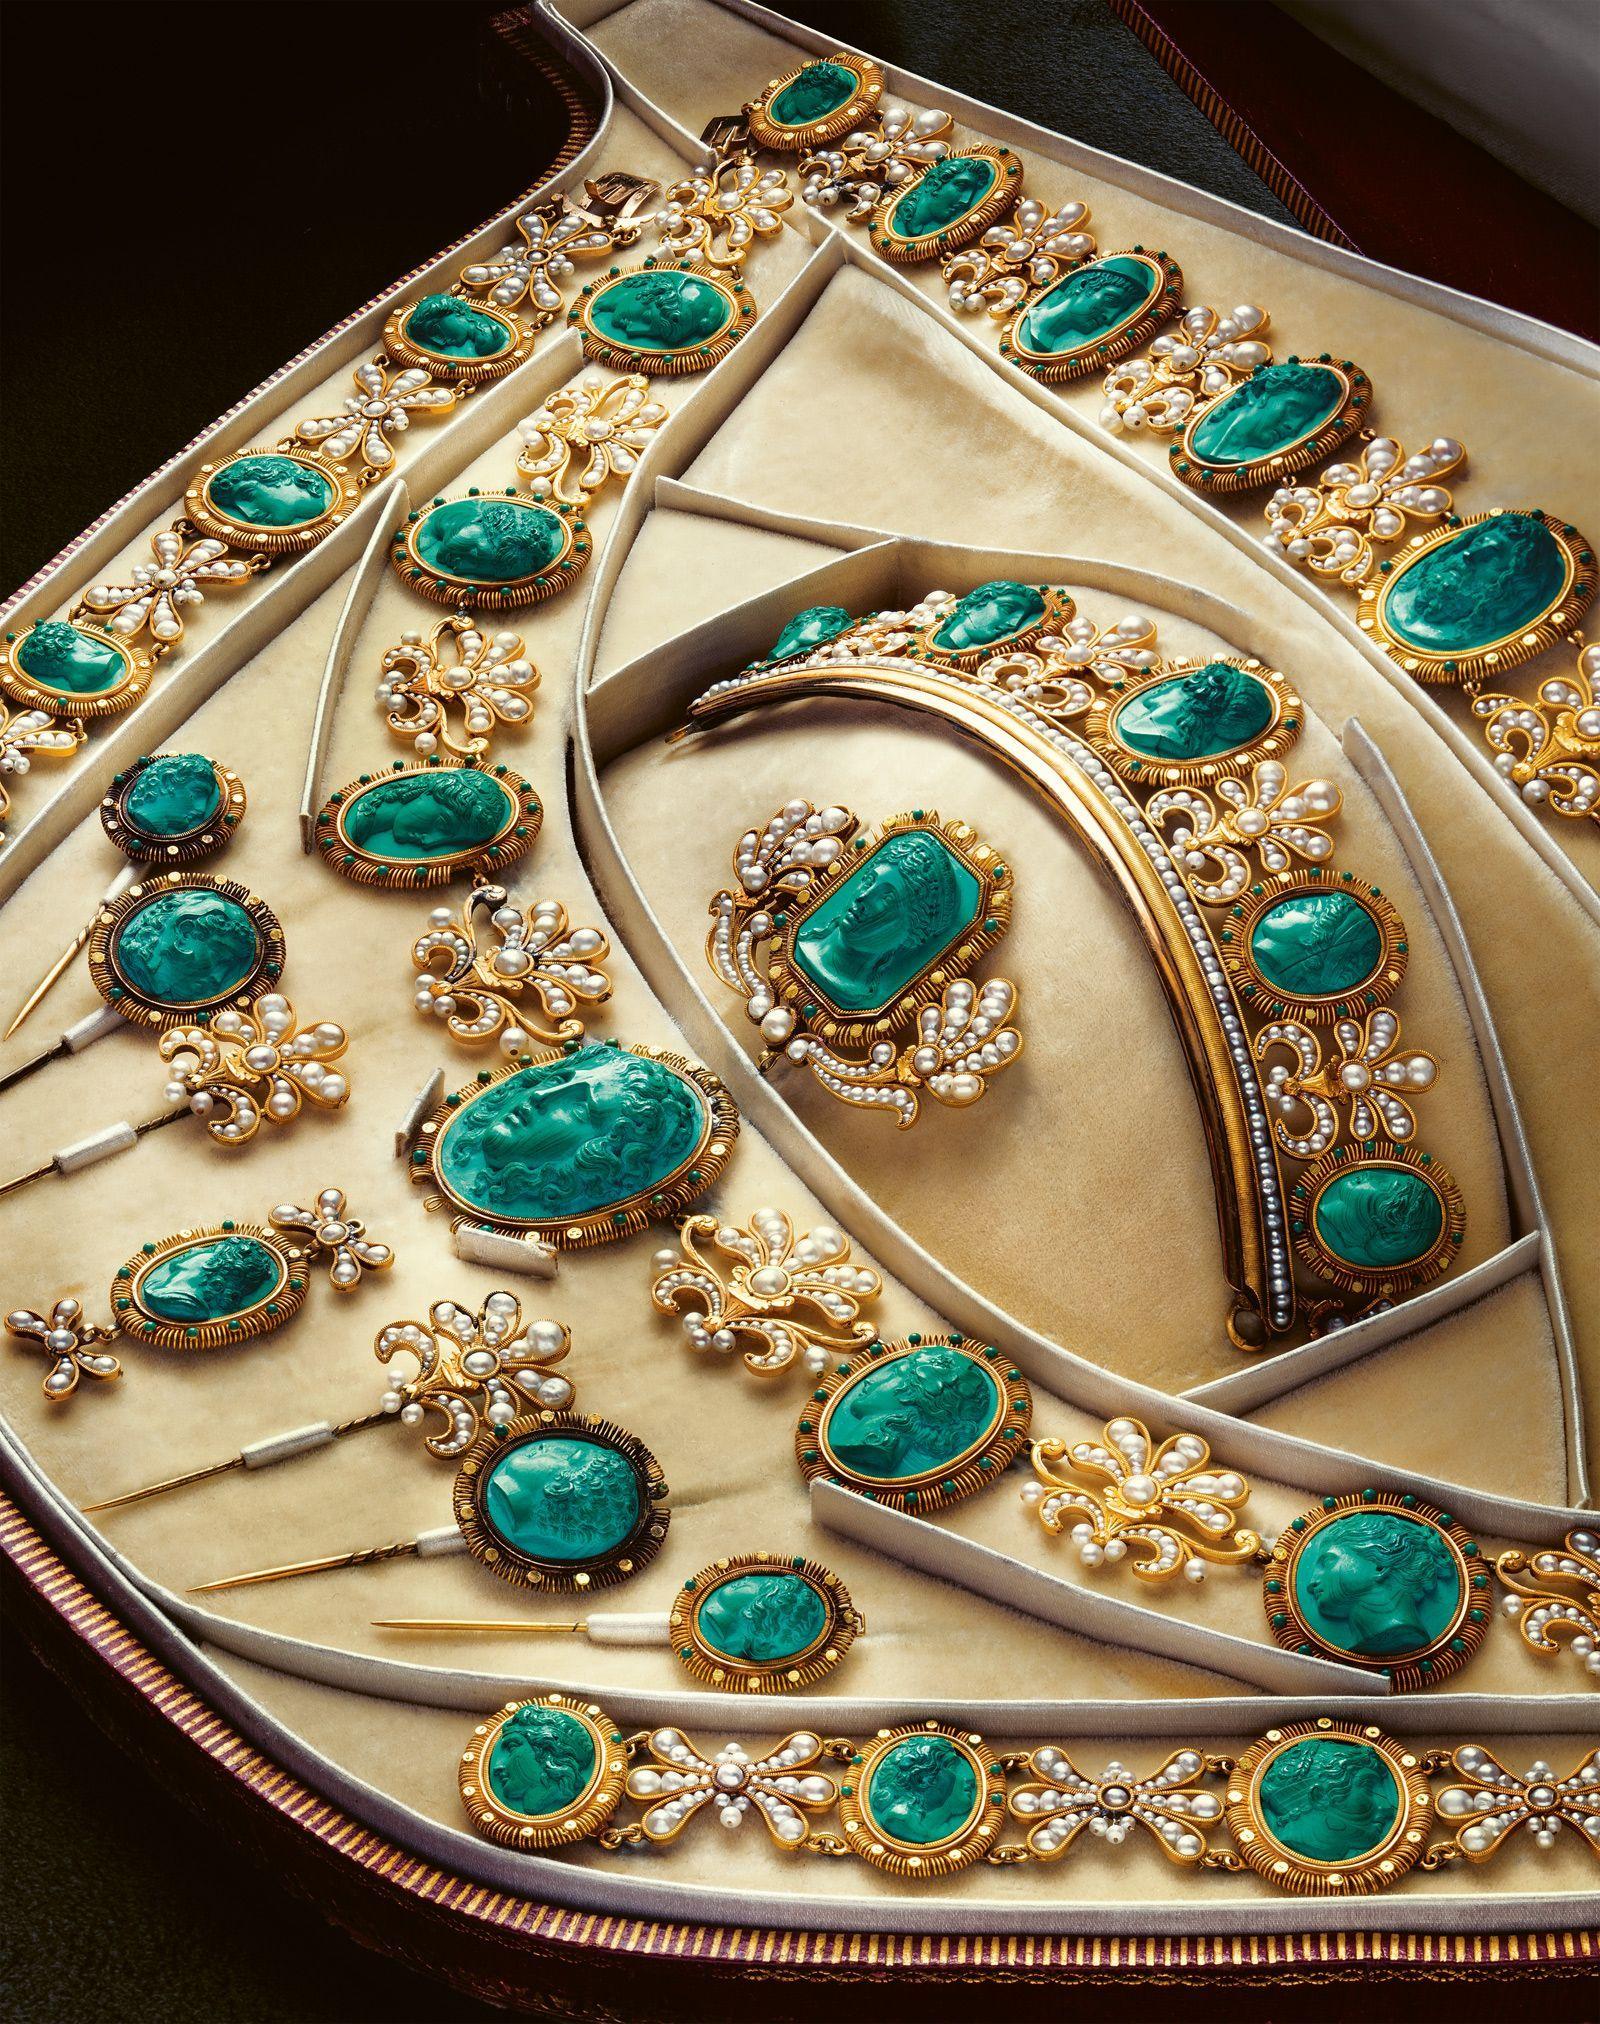 2d1c74365 Empress Josephine's Malachite Parure | Jewels in 2019 | Jewelry ...